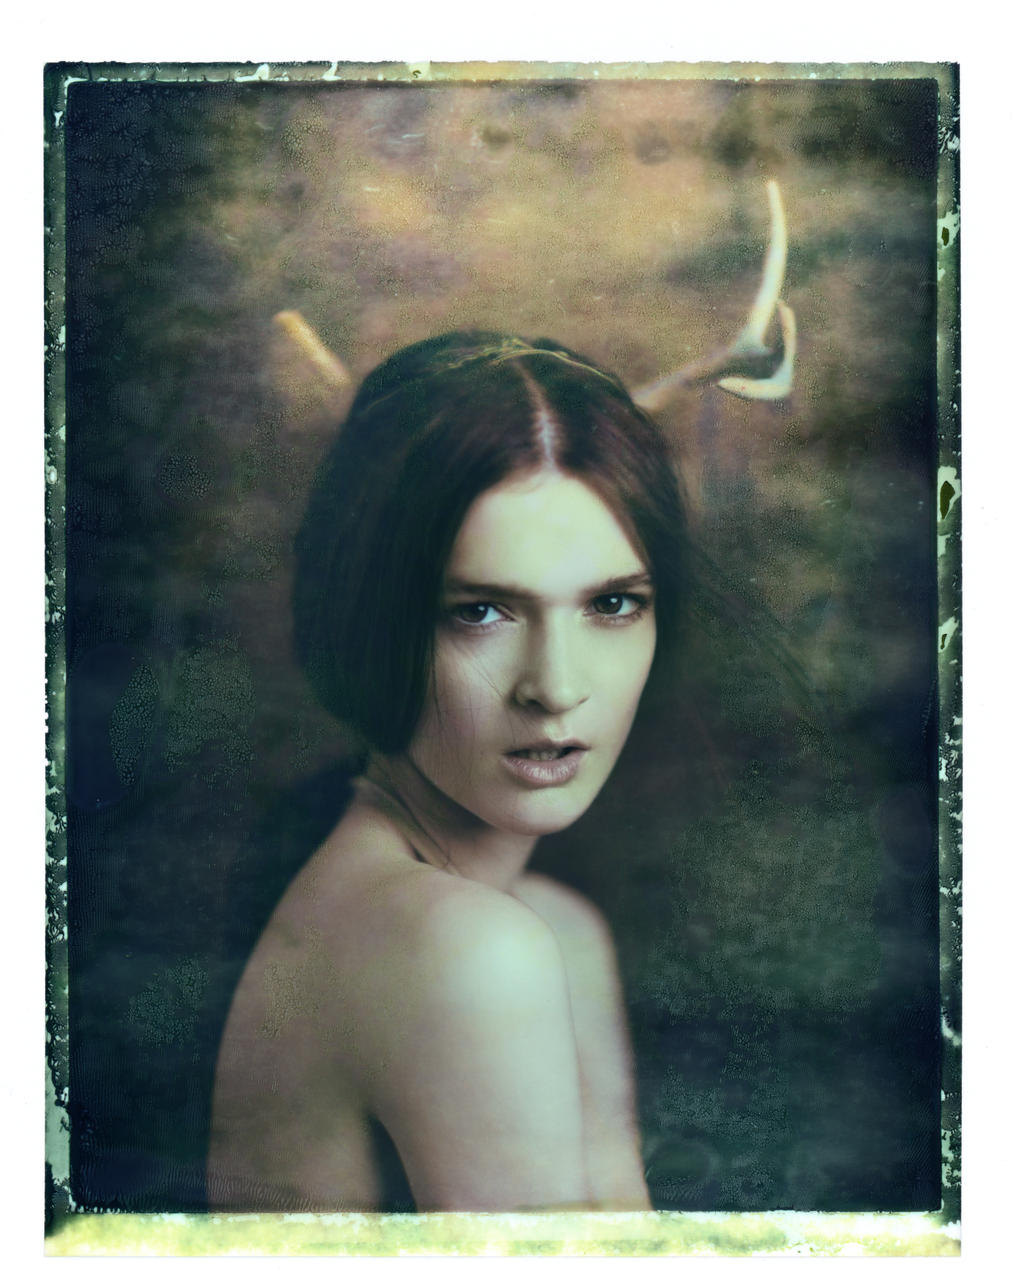 ... Emily Soto - Annabelle 25 by corvus-crux